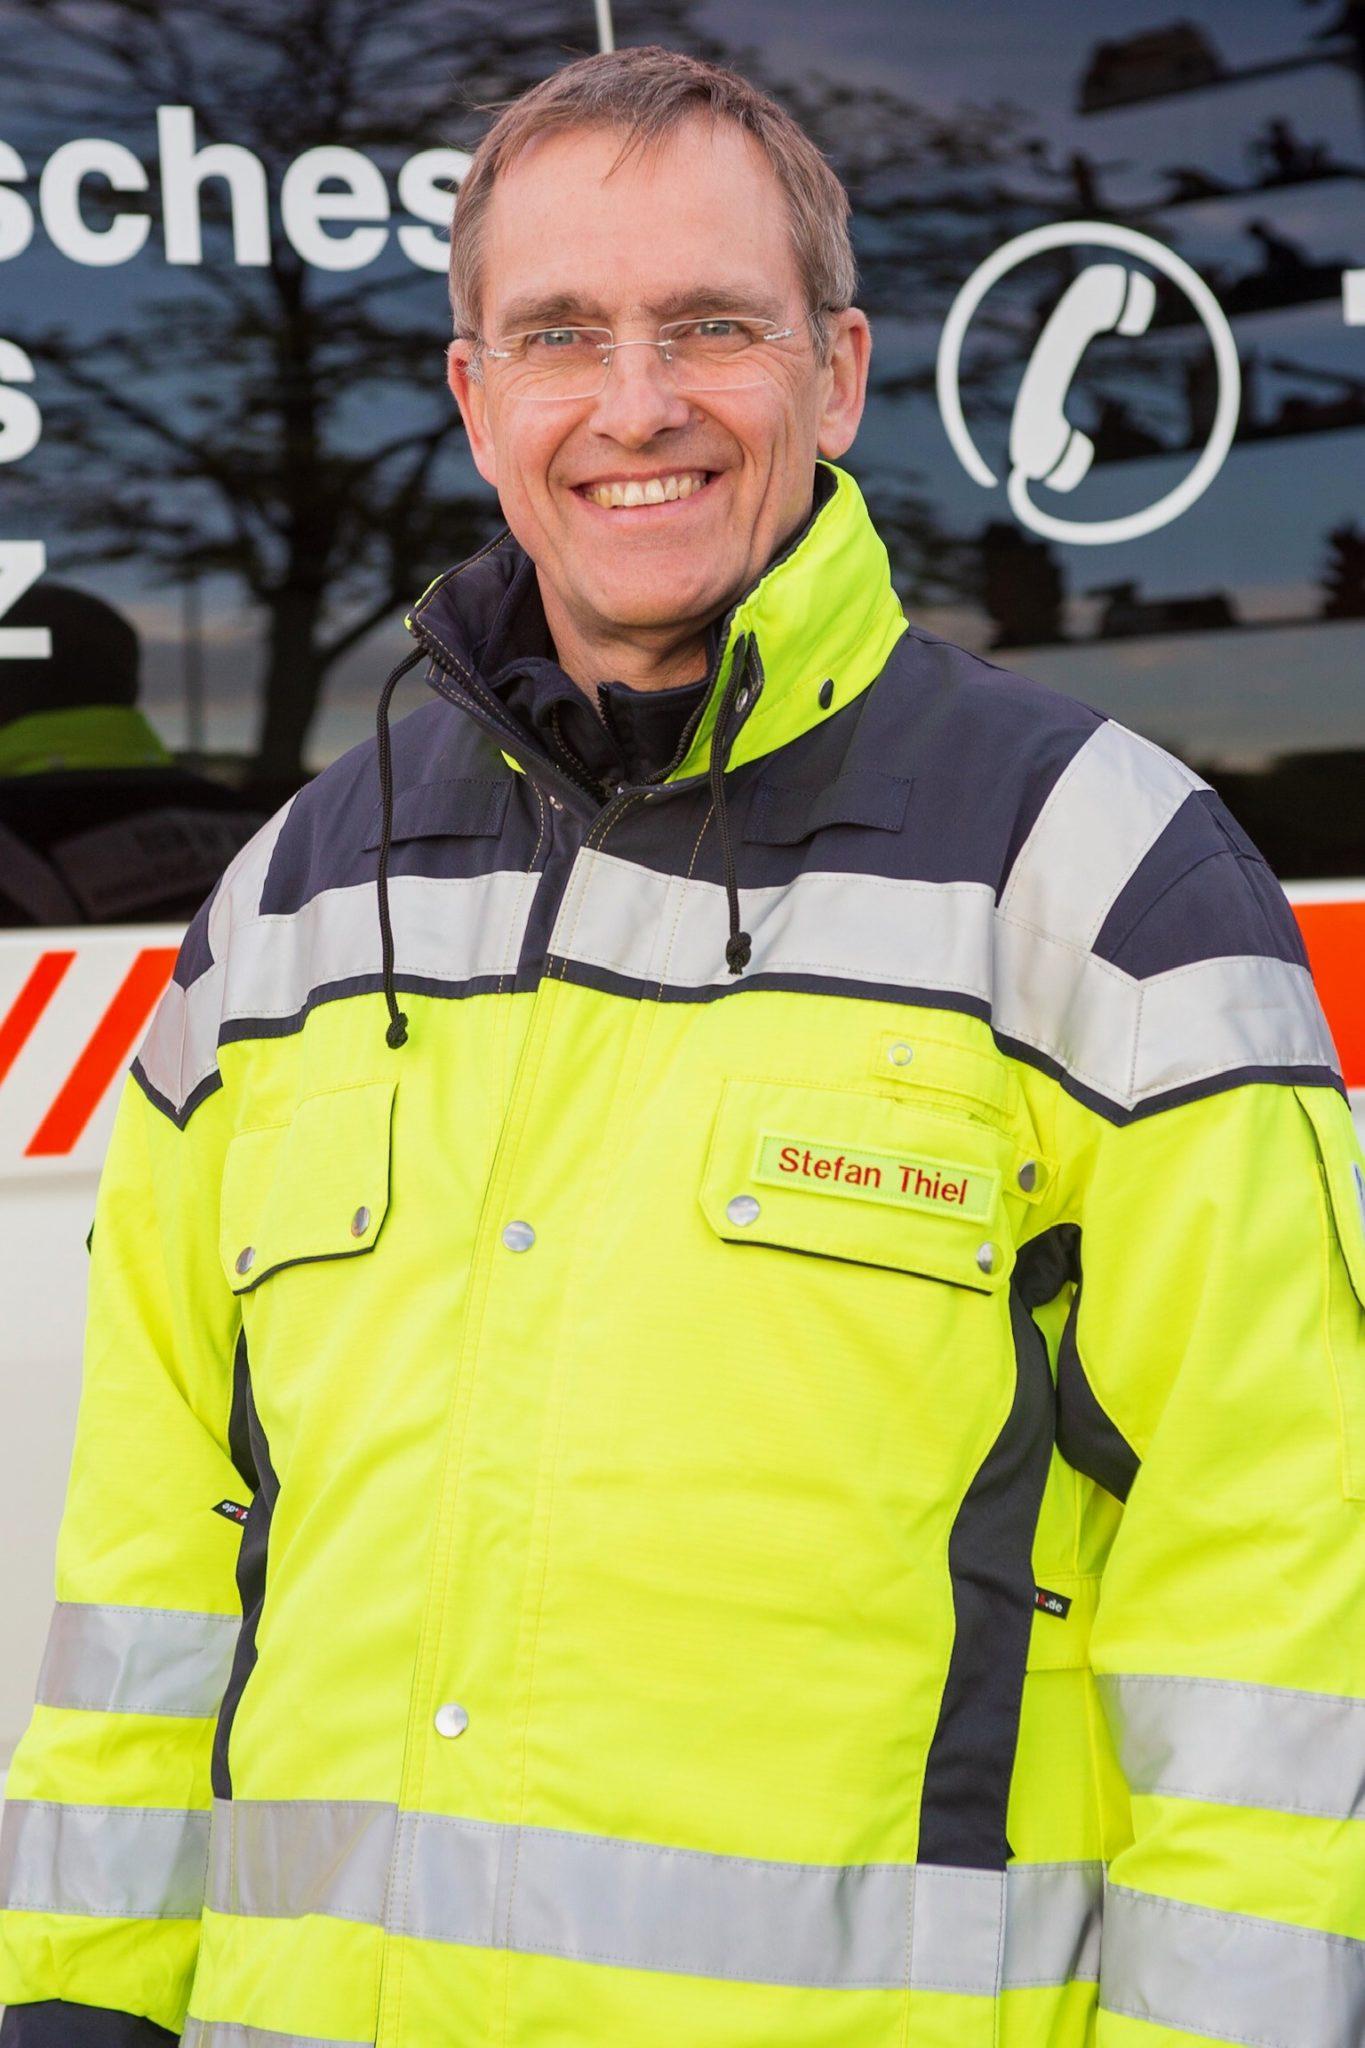 Stefan Thiel